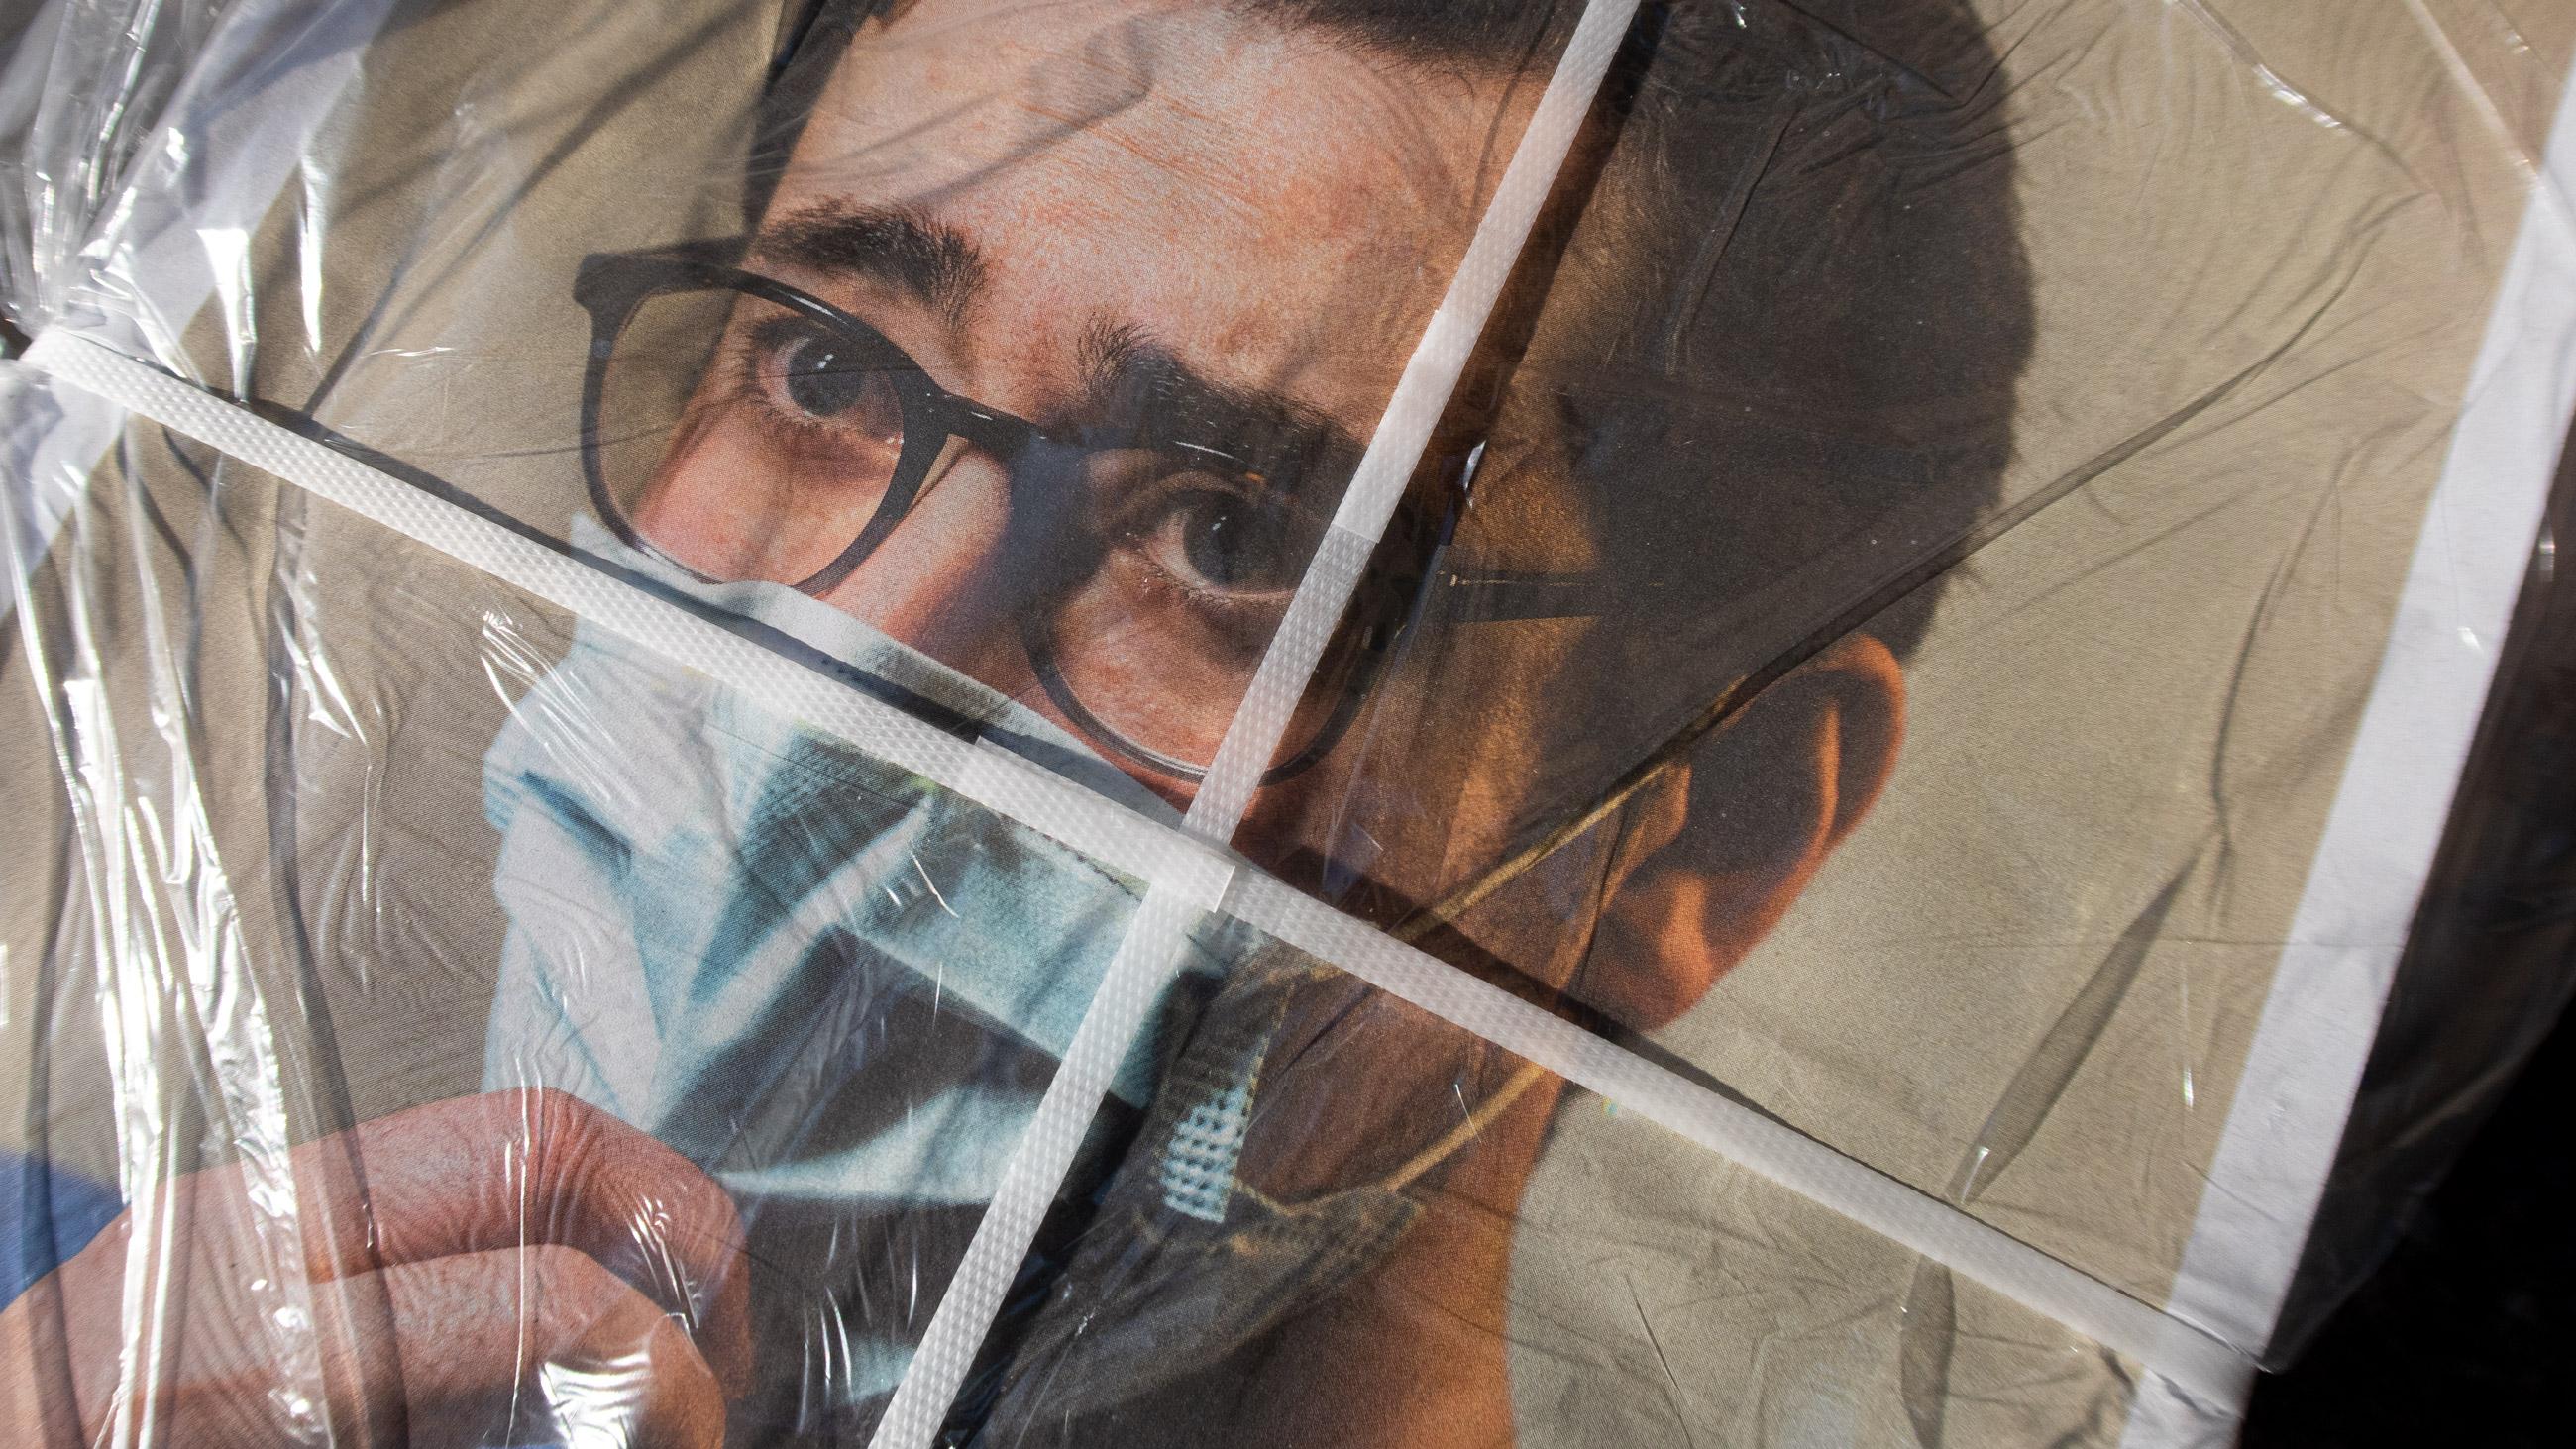 verpackte Zeitung des Stuttgarter Fotografen Patrick junker